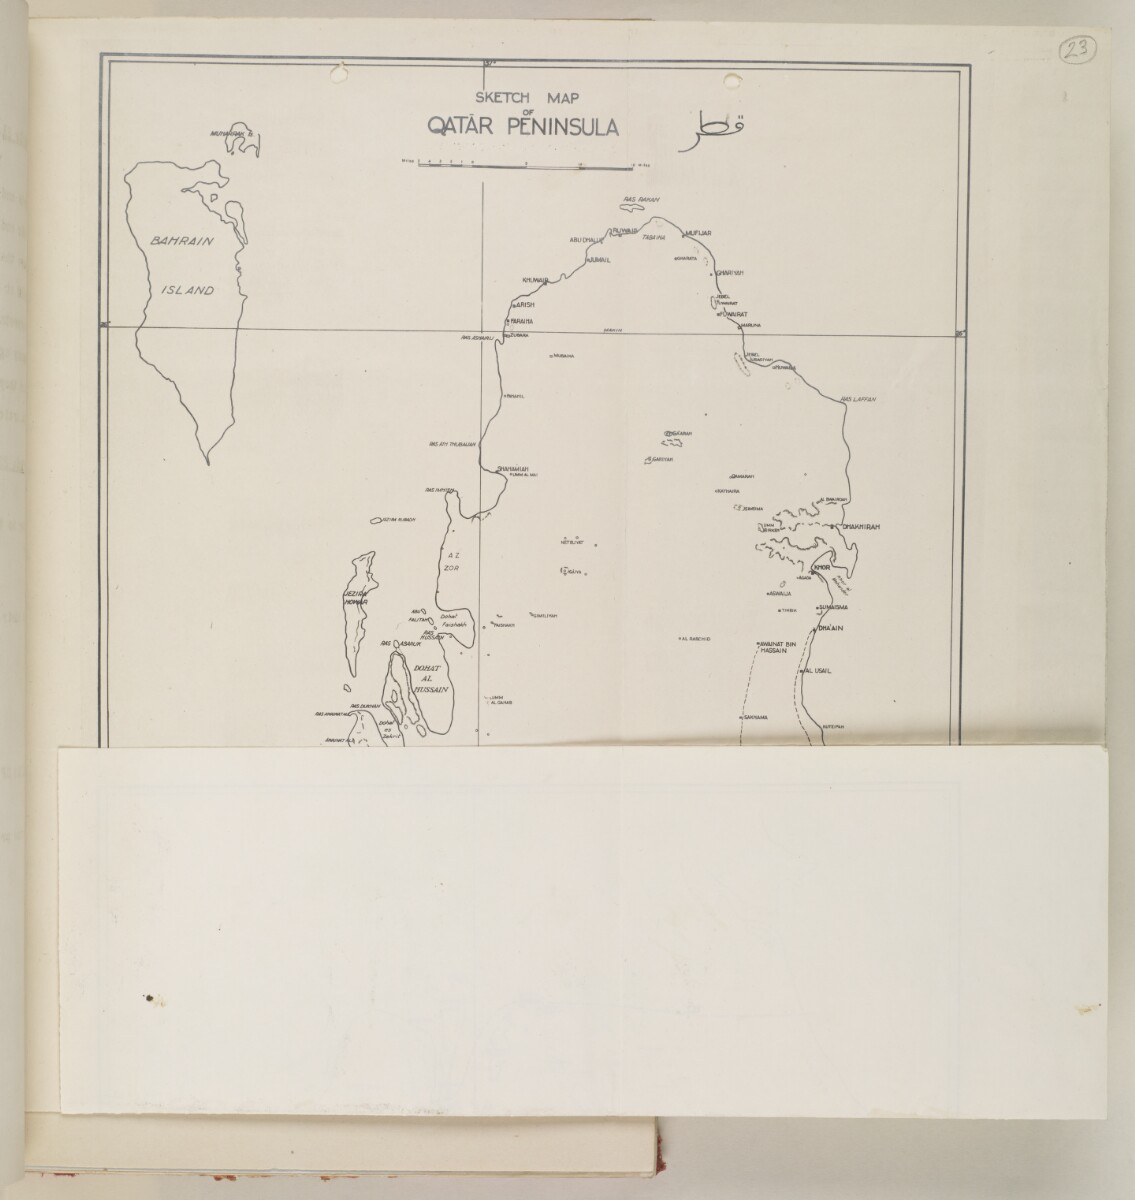 'SKETCH MAP OF QATAR PENINSULA' [23v] (2/2)